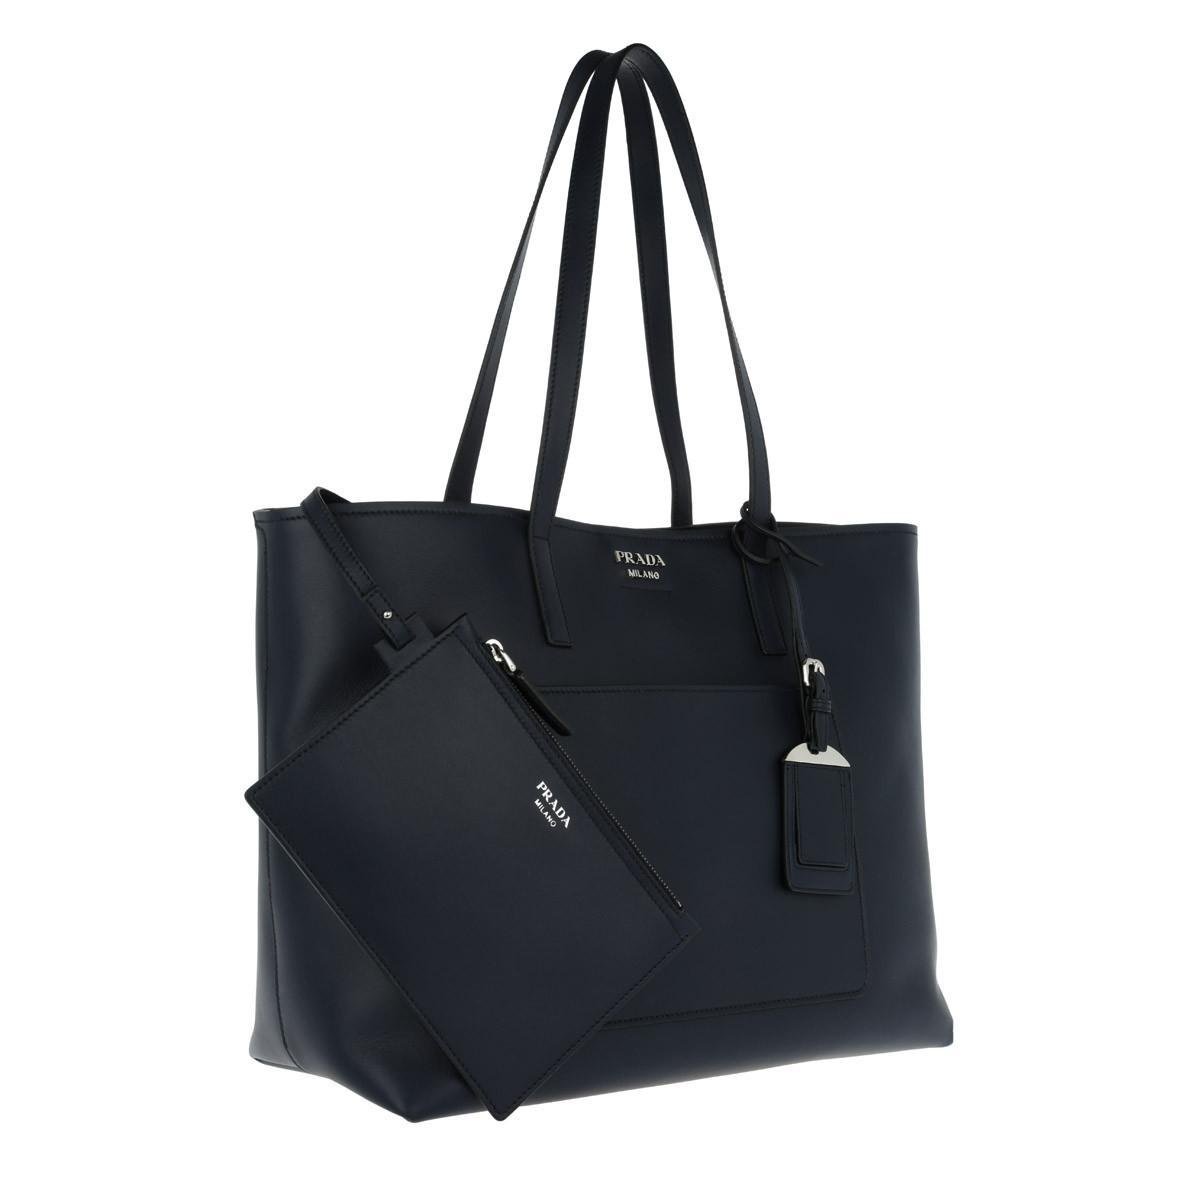 Tote - Dual Bag Calfskin Azzurro/Nero - blue, black - Tote for ladies Prada